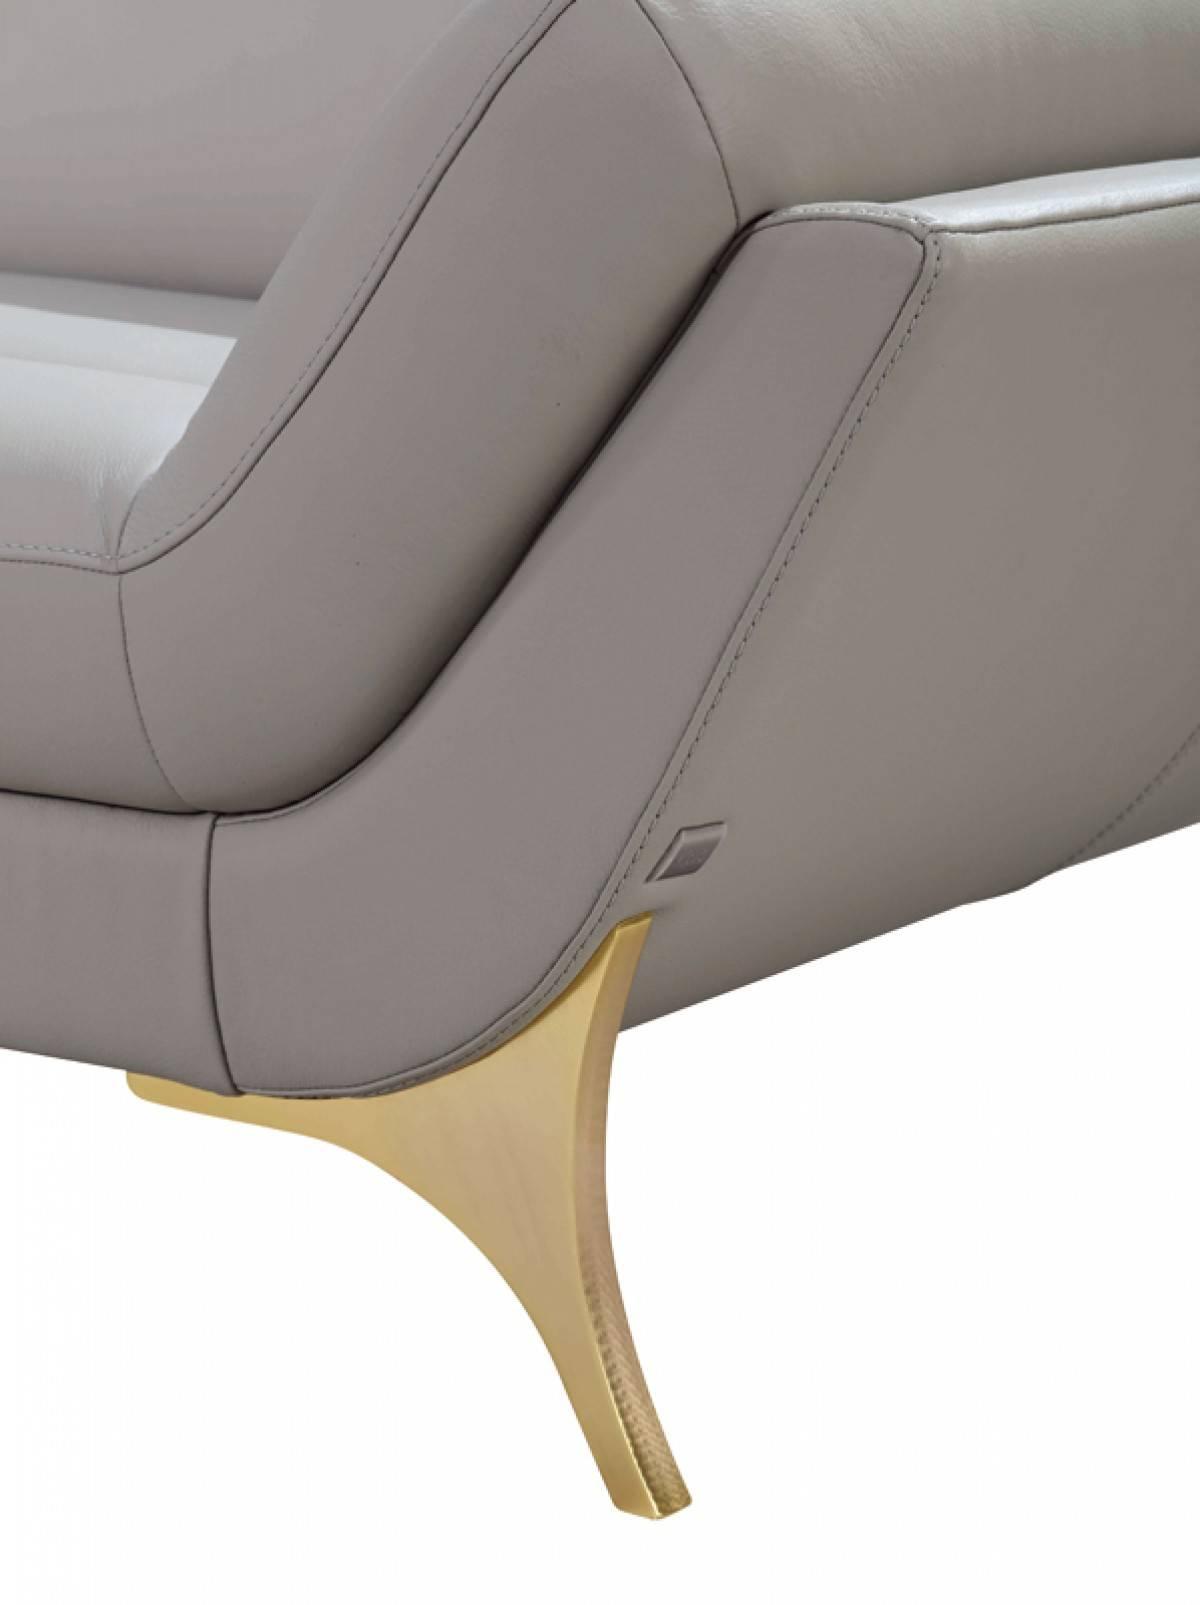 Luxury Italian Top Grain Leather Sectional Sofa Dallas Texas VIG